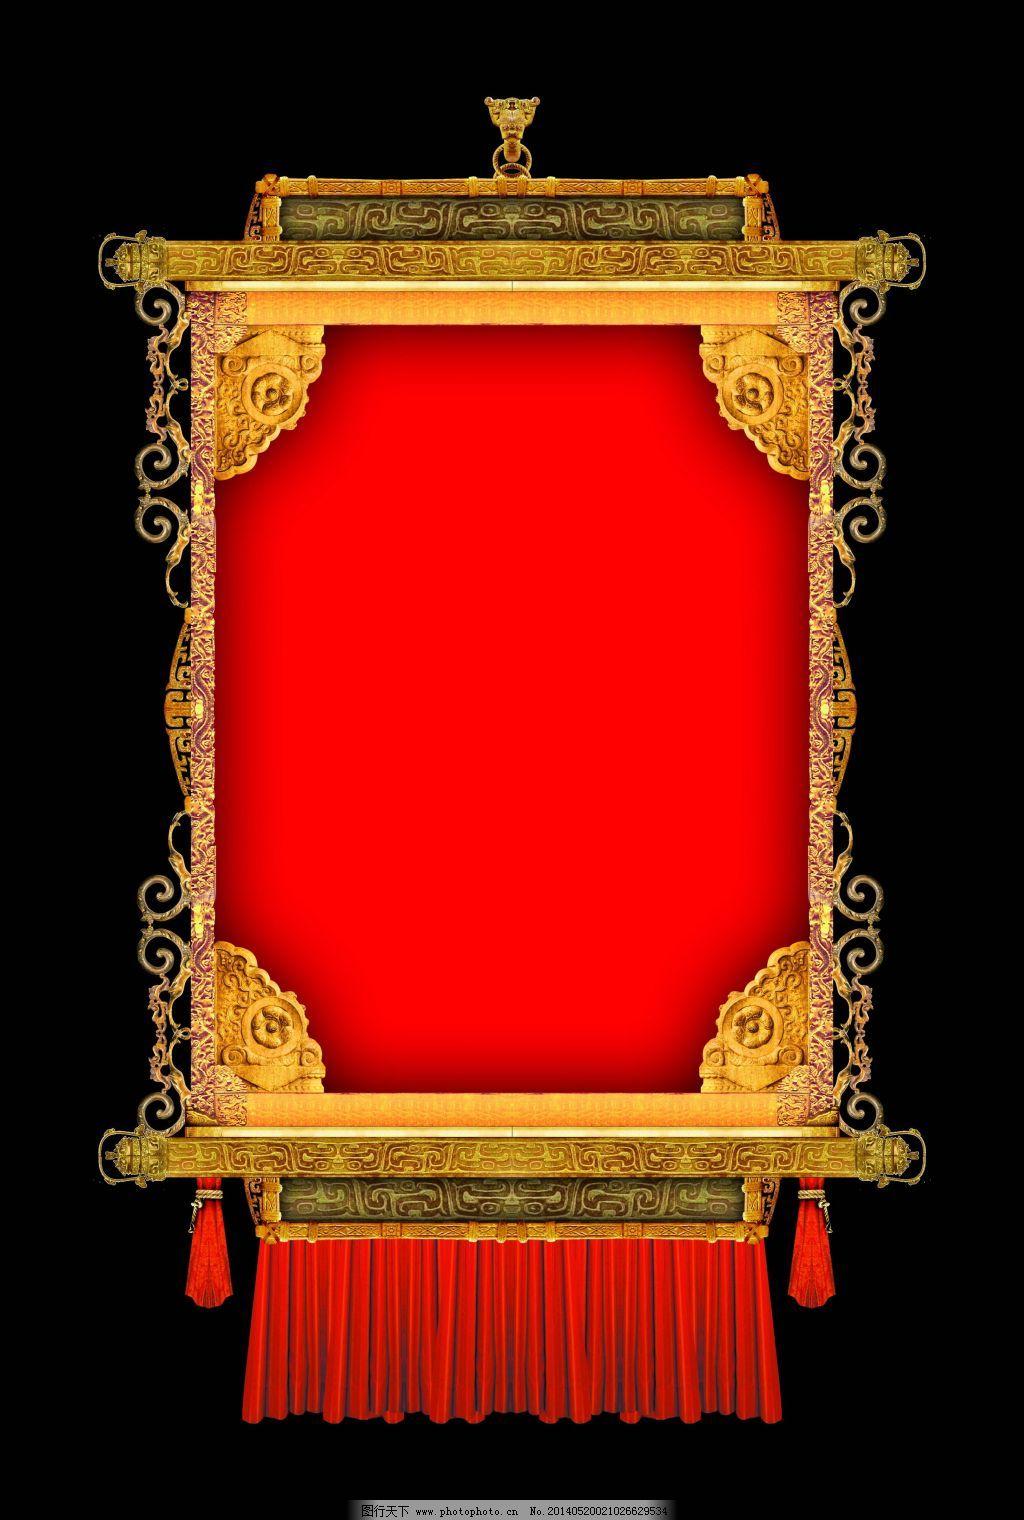 ppt 背景 背景图片 边框 模板 设计 相框 1024_1520 竖版 竖屏